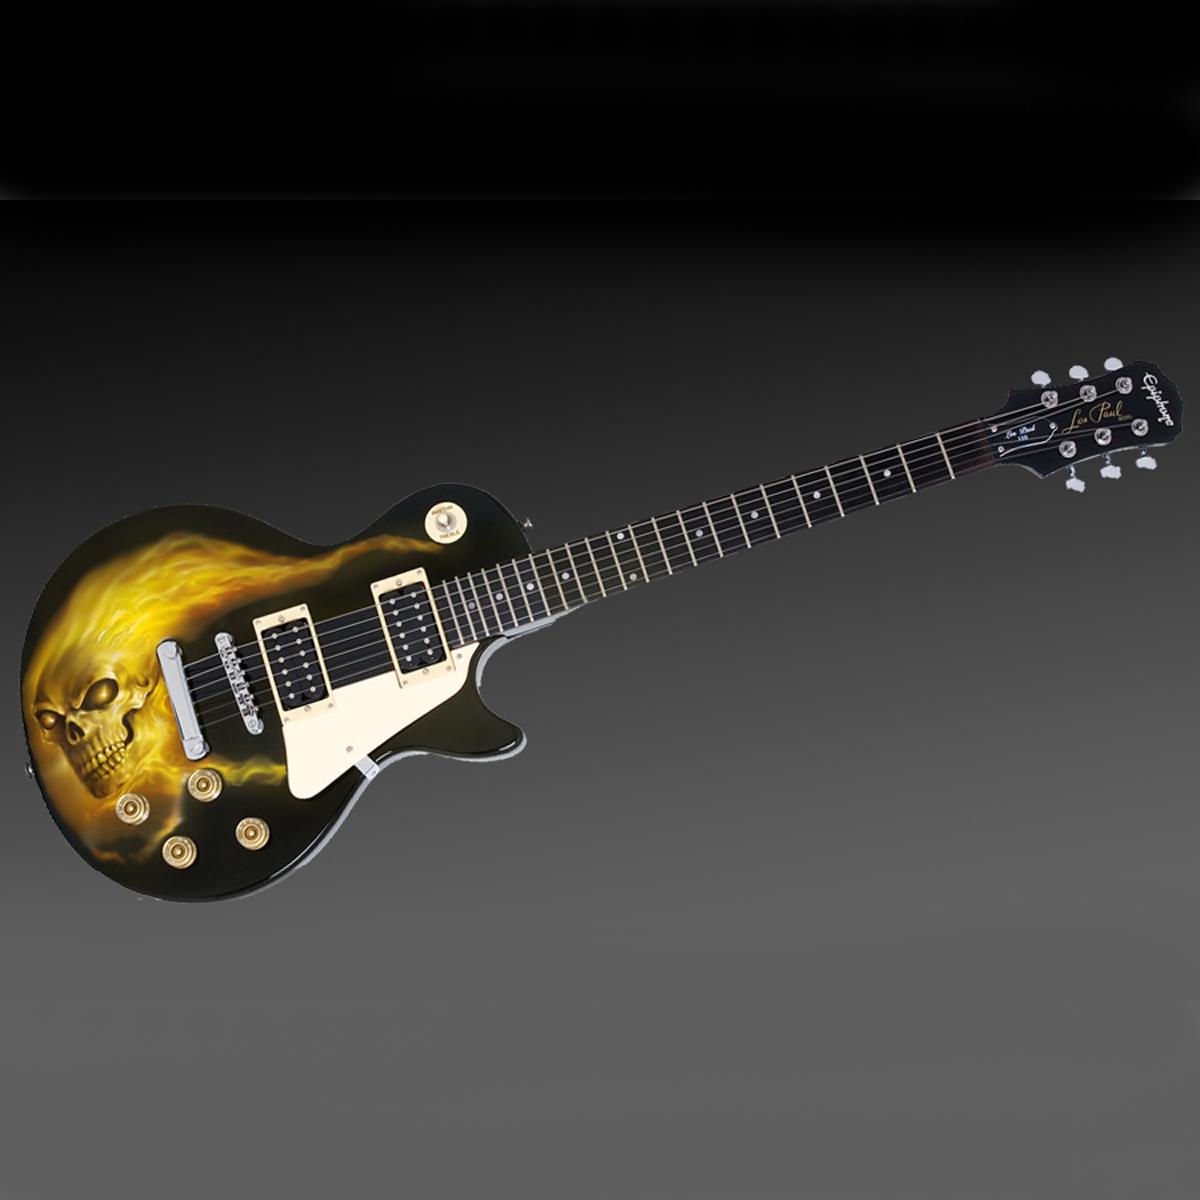 Les Paul Skull Guitar